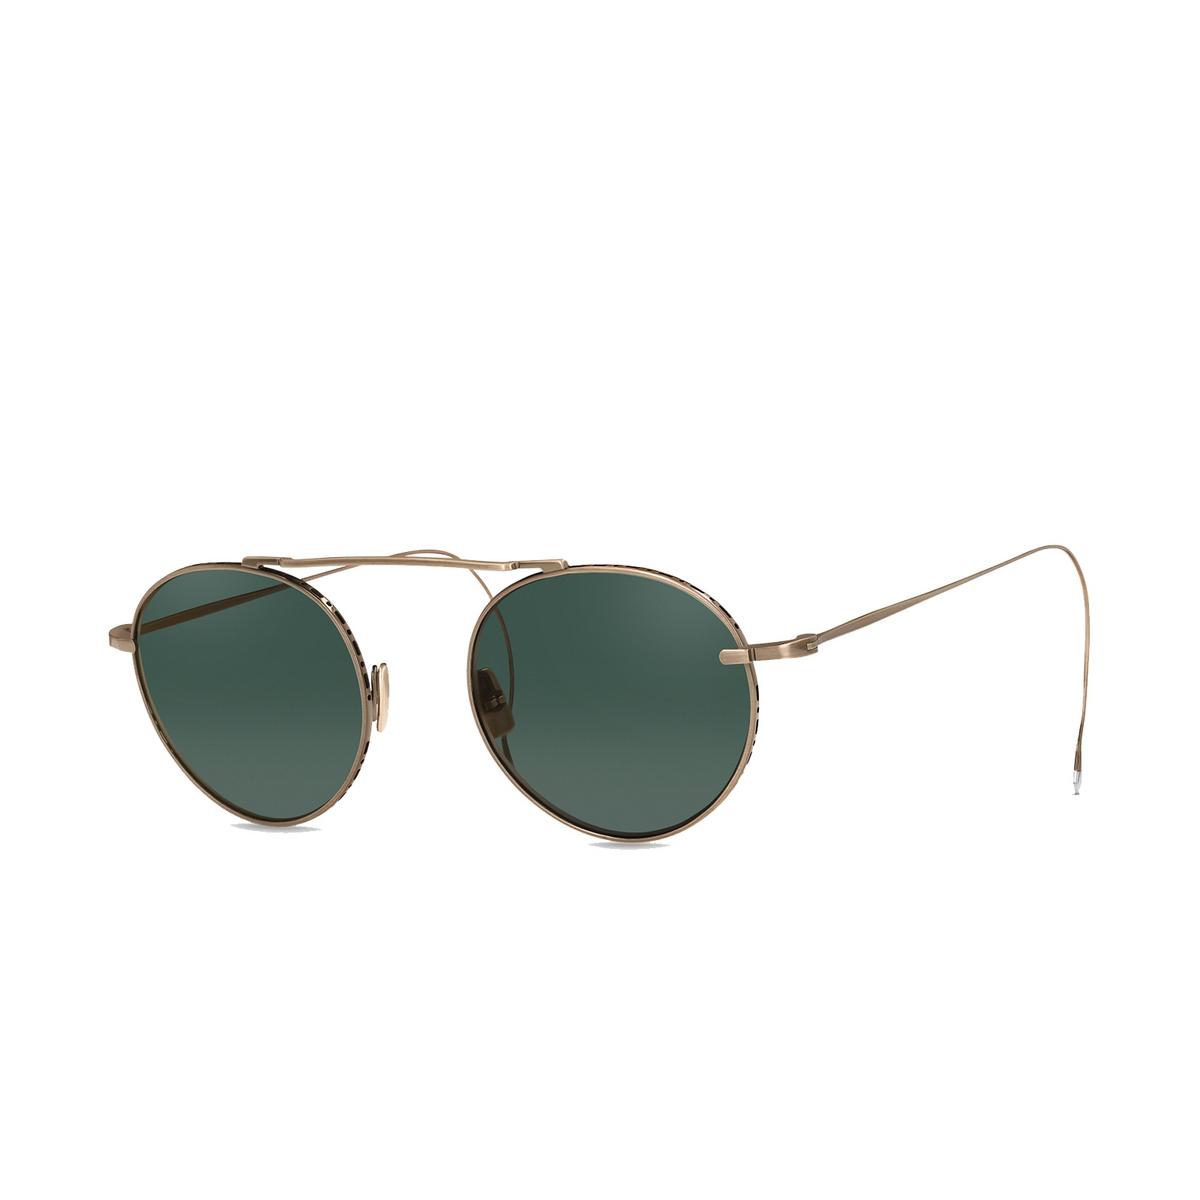 Mr. Leight® Aviator Sunglasses: Rei S color ATG/G15.